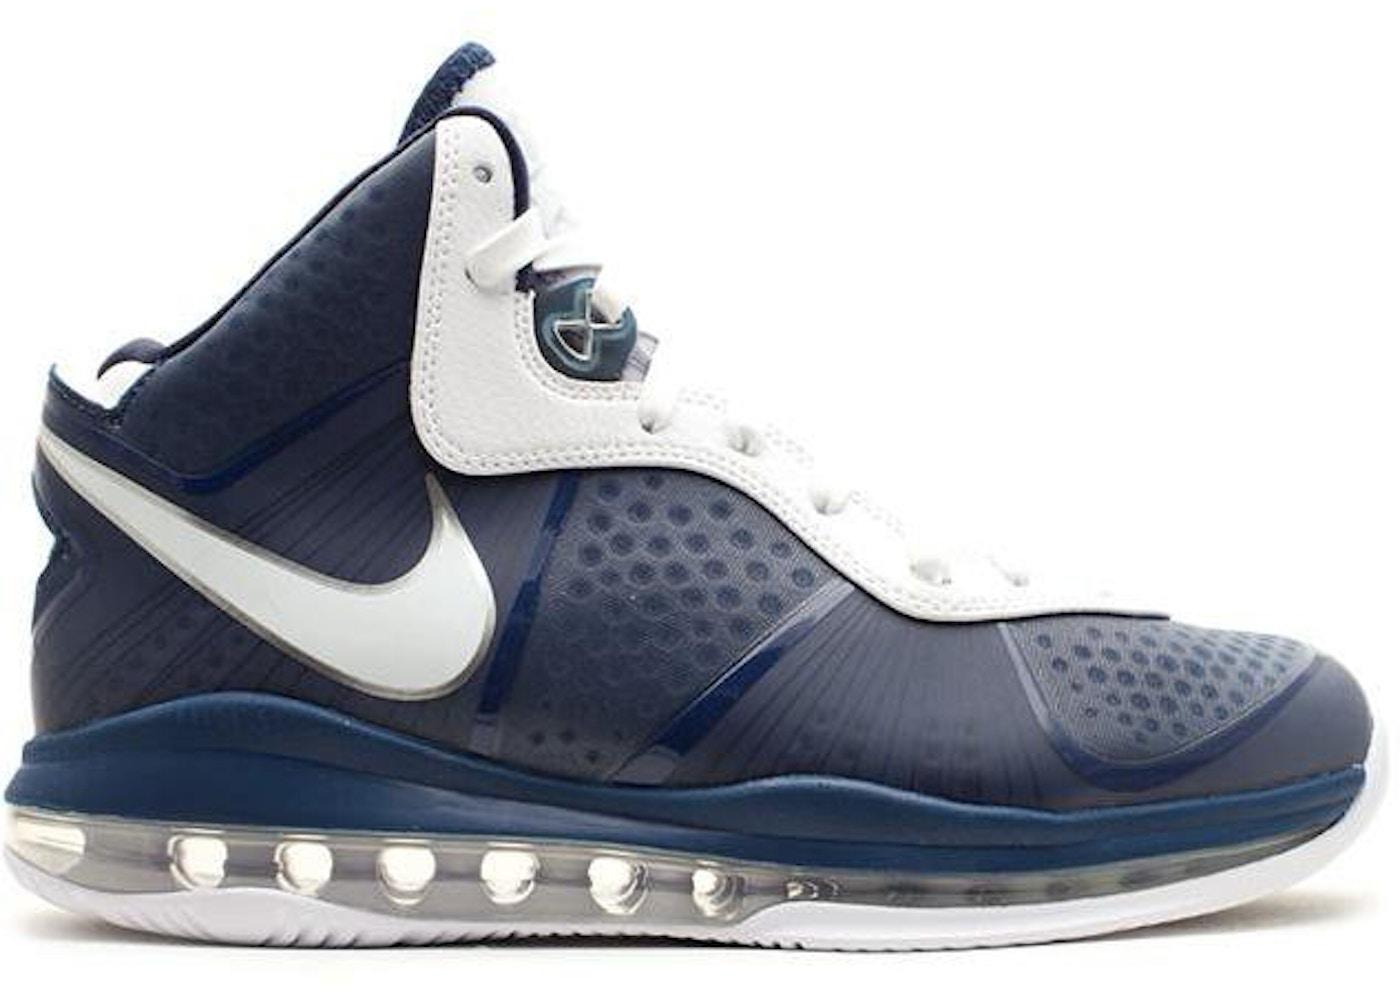 best website fc2eb 35c58 Nike LeBron 8 Shoes - Price Premium